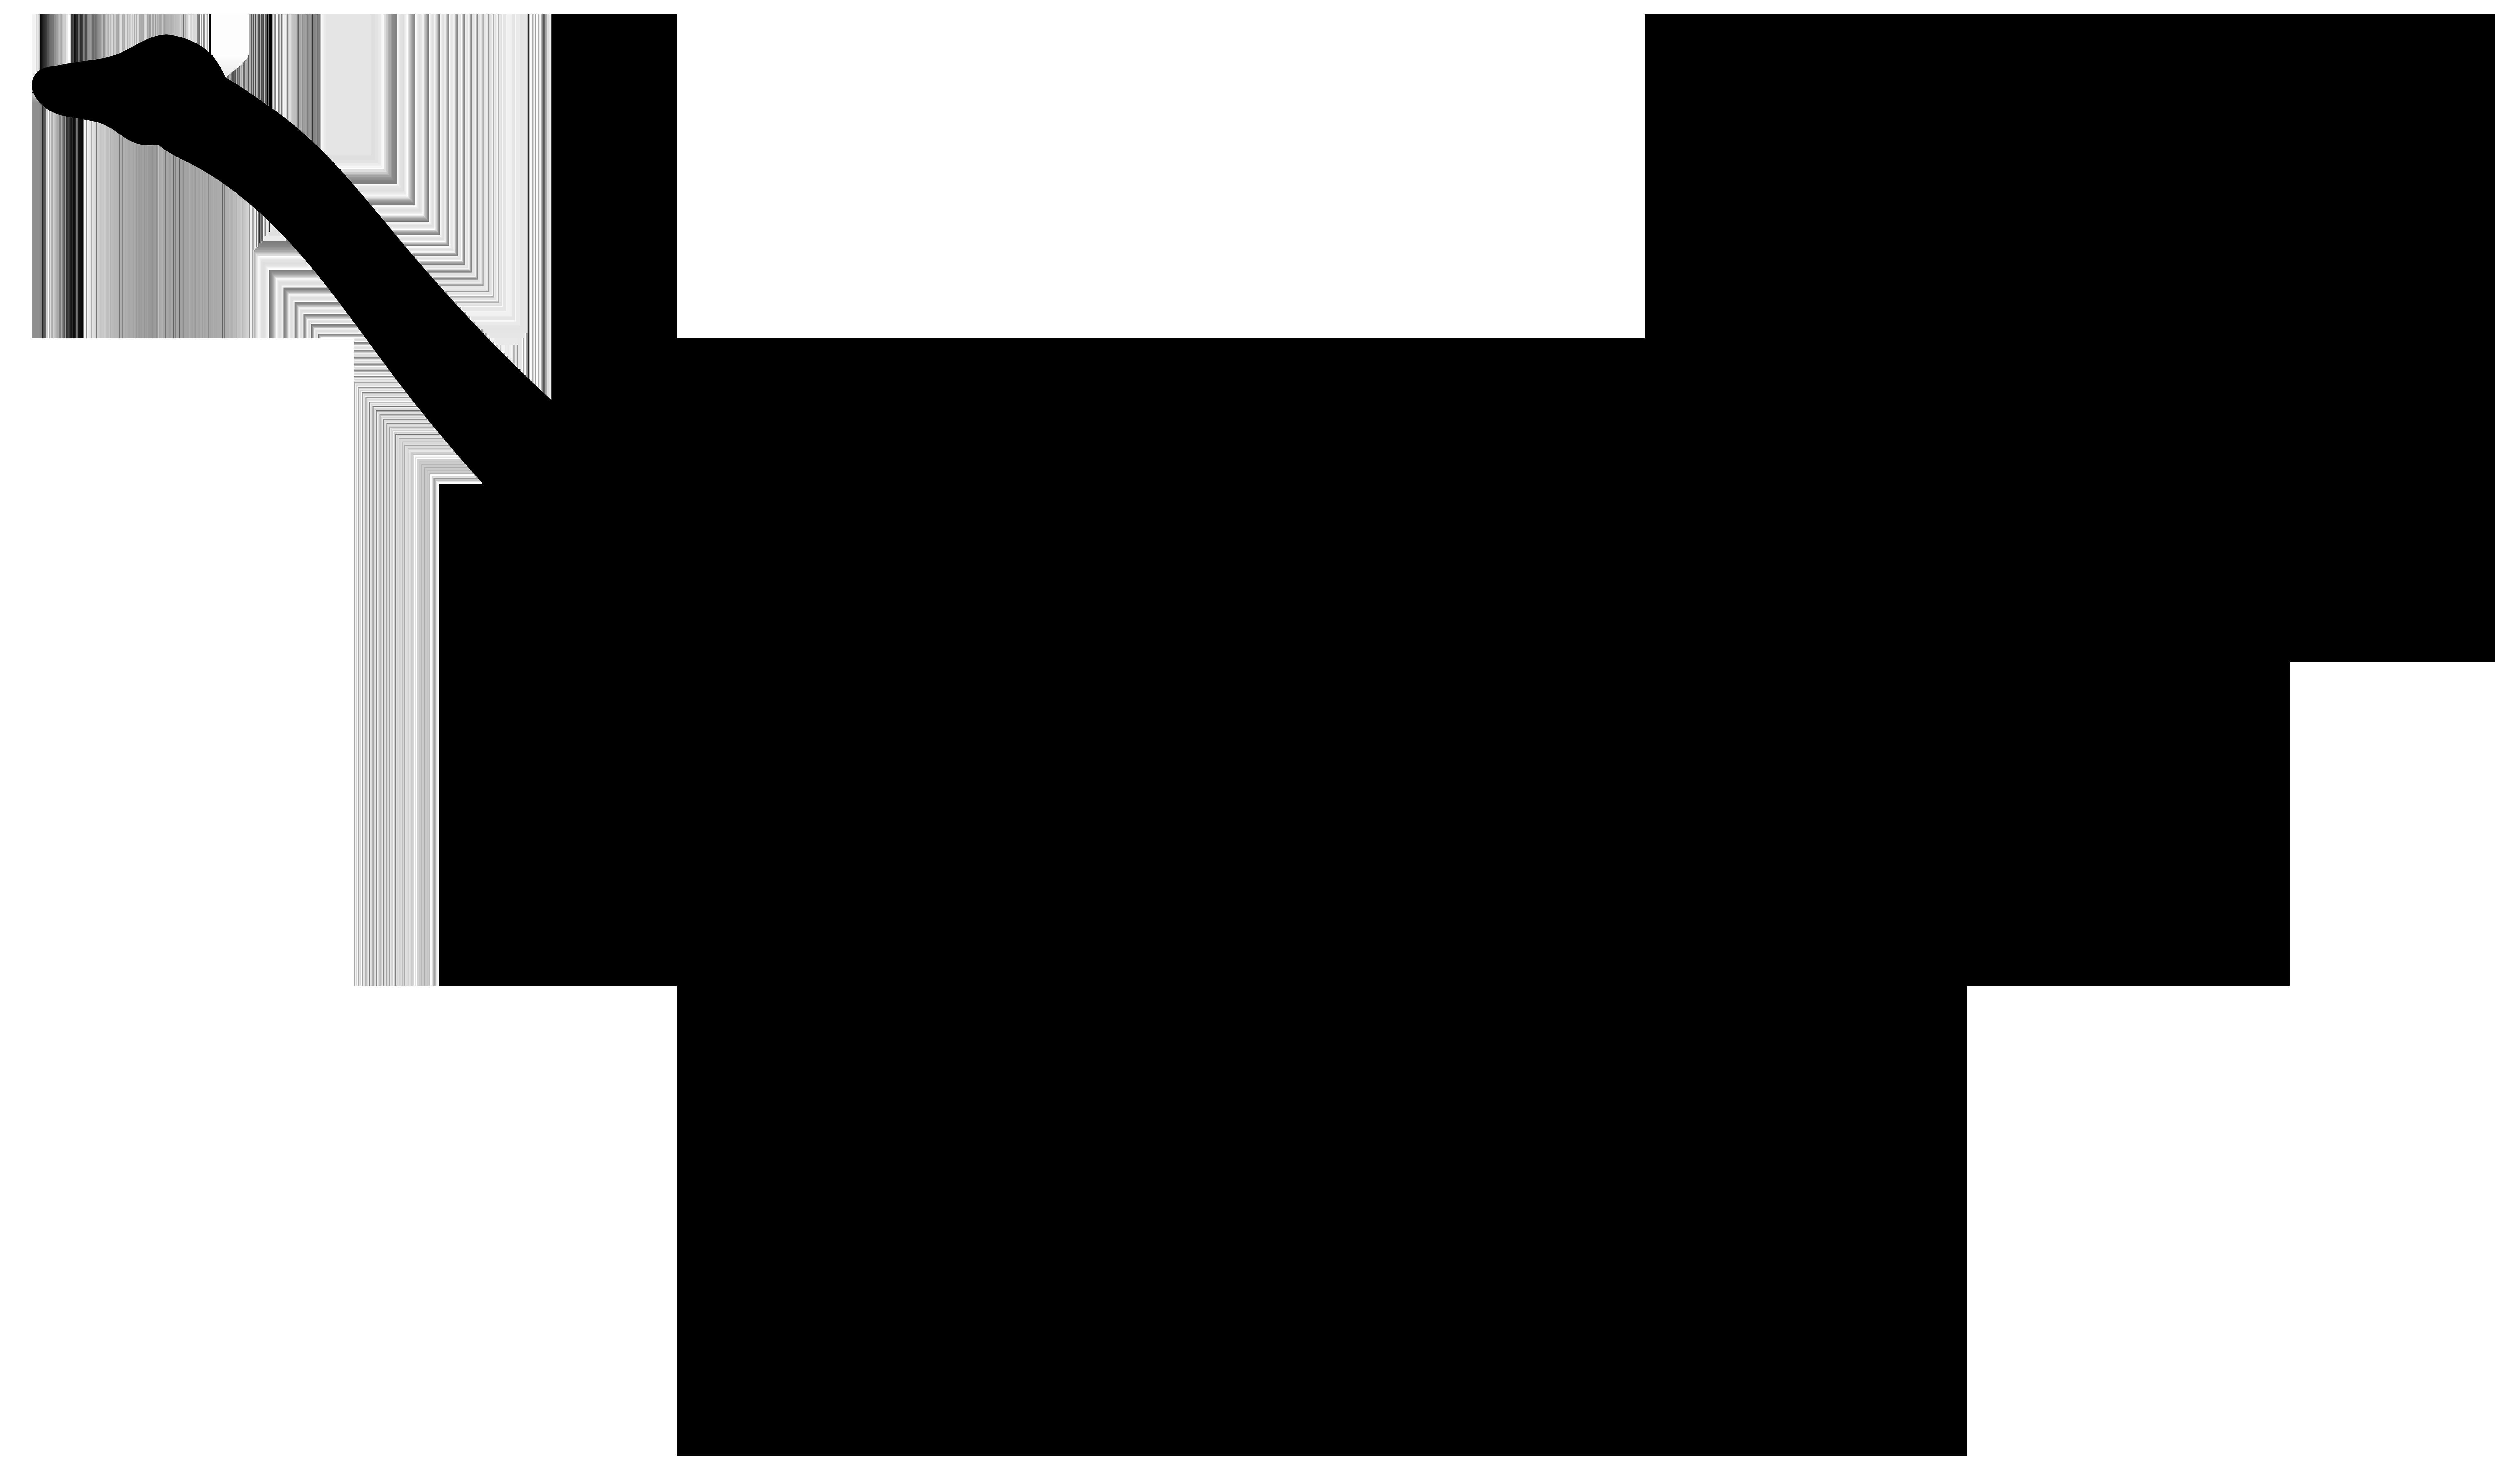 Dinosaur Silhouette PNG Transparent Clip Art Image.